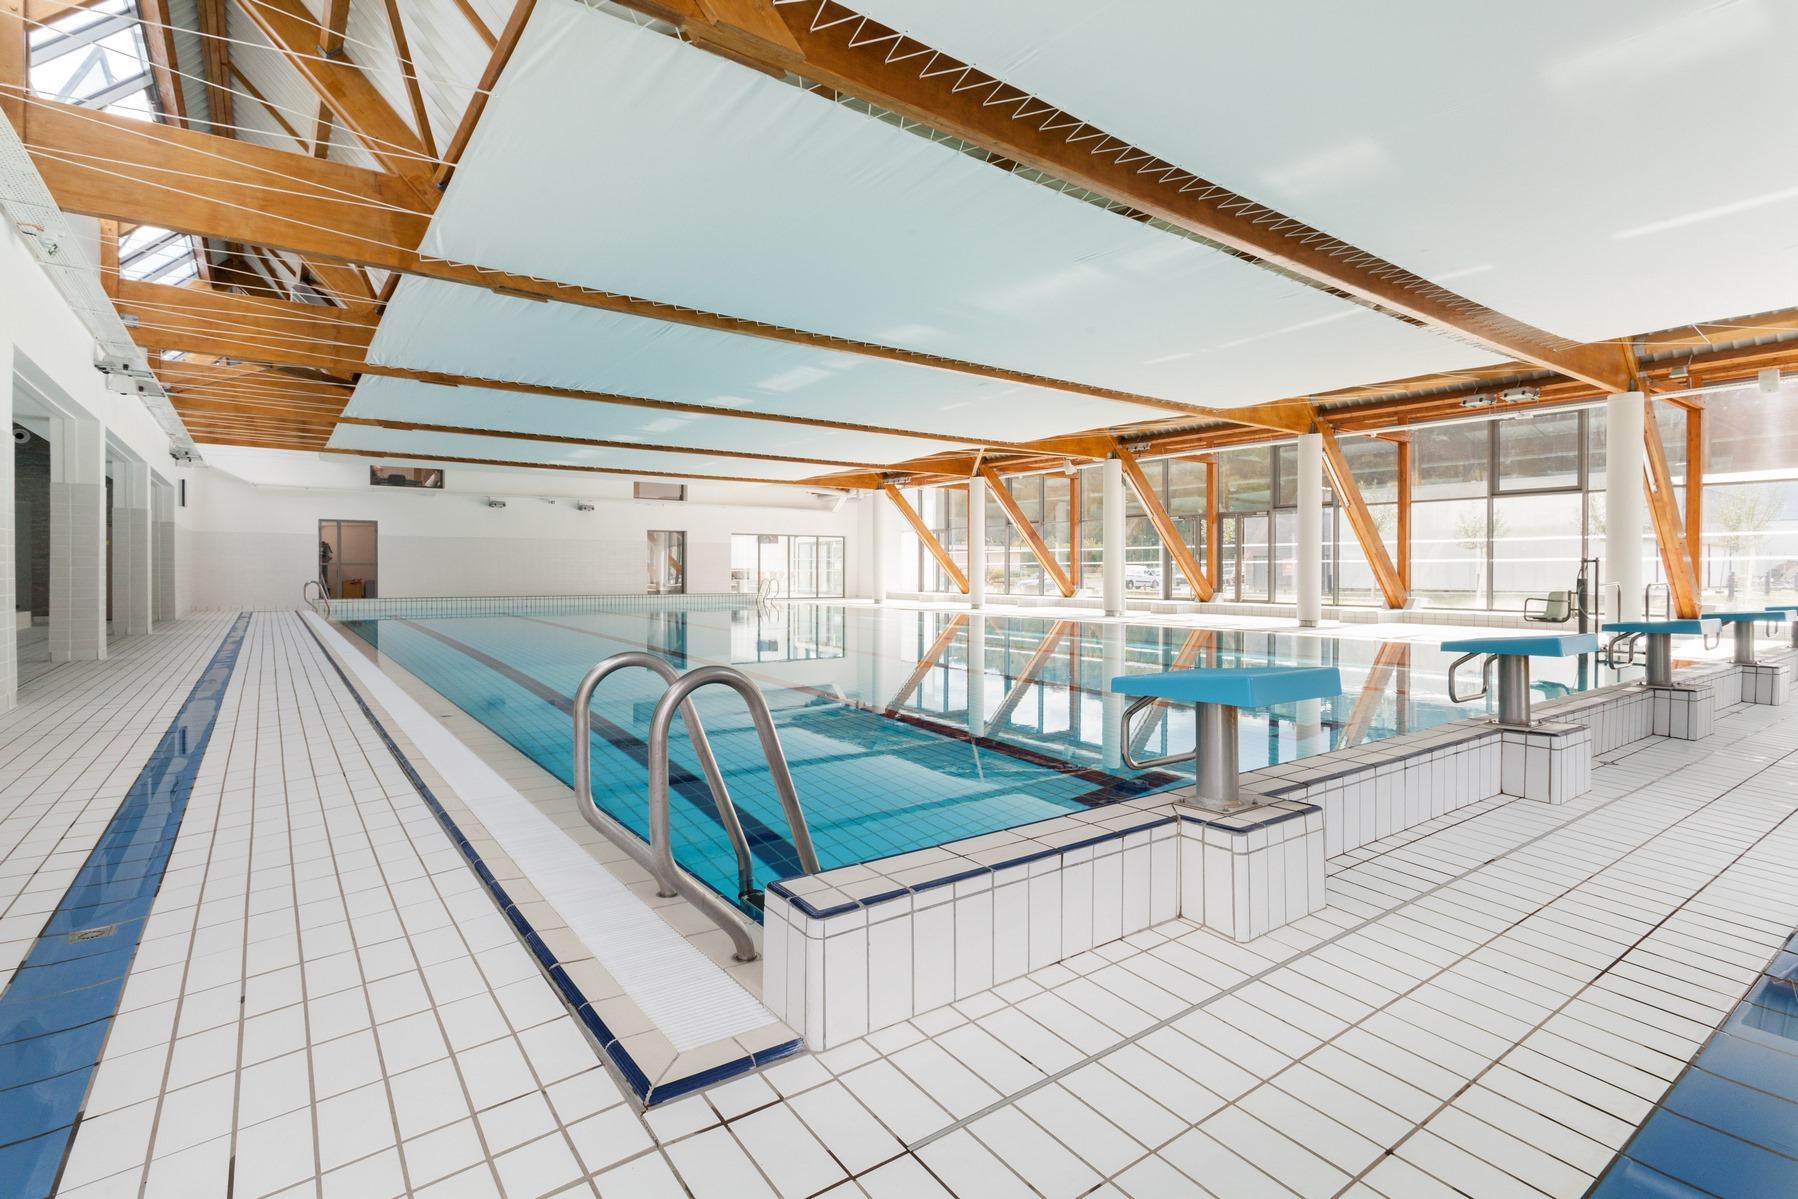 Complexe sportif et culturel intercommunal - Couloisy - Z Architecture